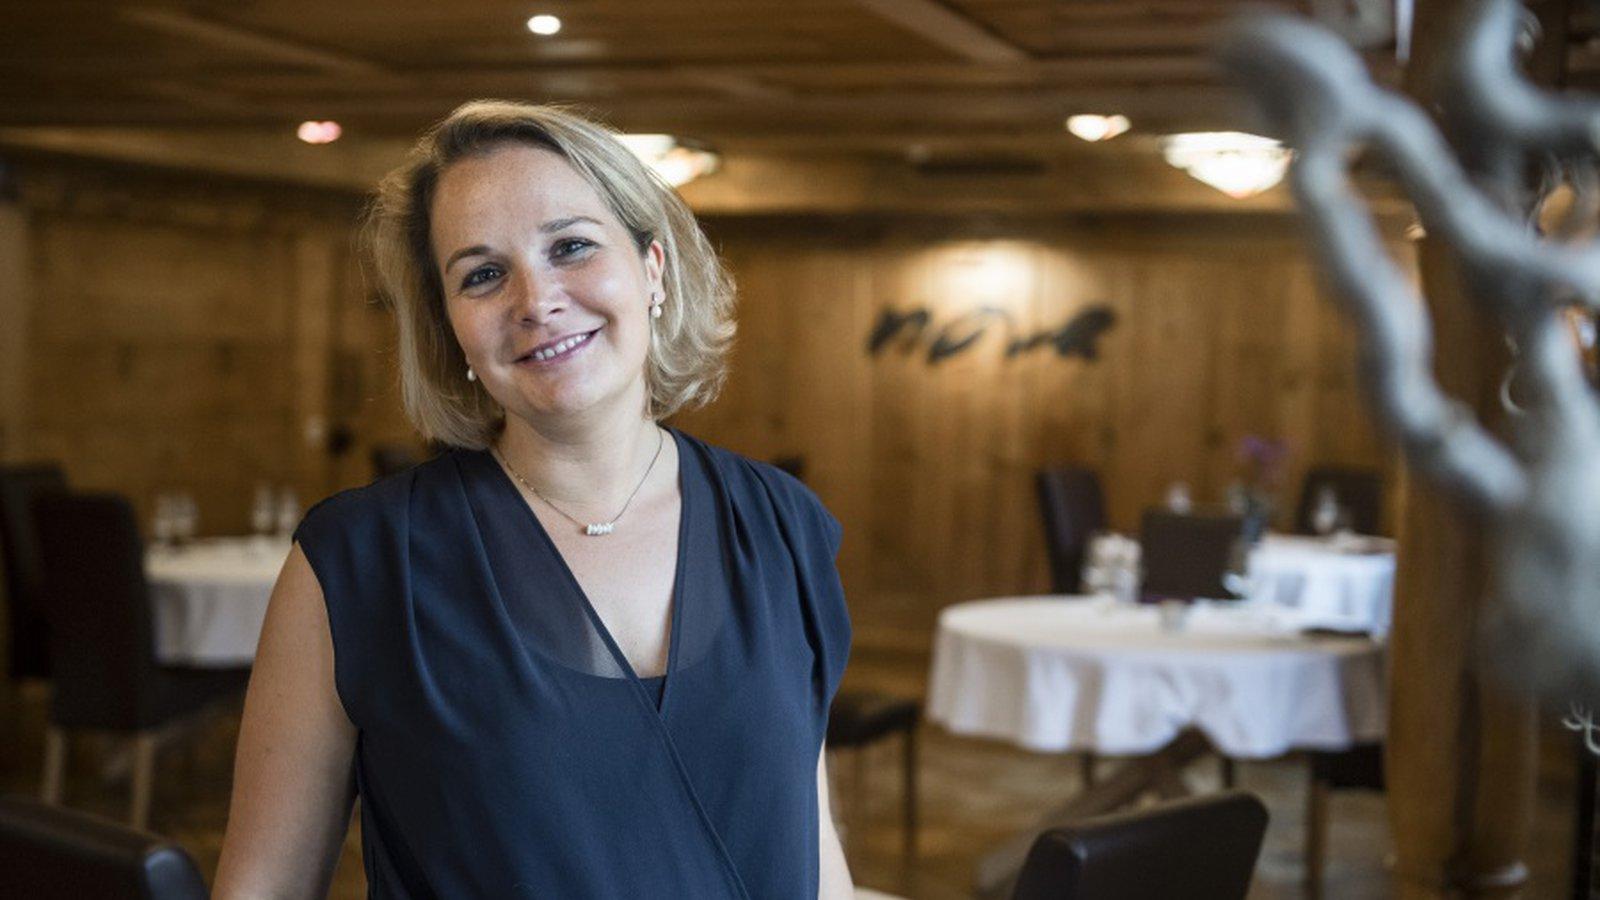 Alexandra Ziörjen rettet Restaurant und bekommt Michelin-Stern